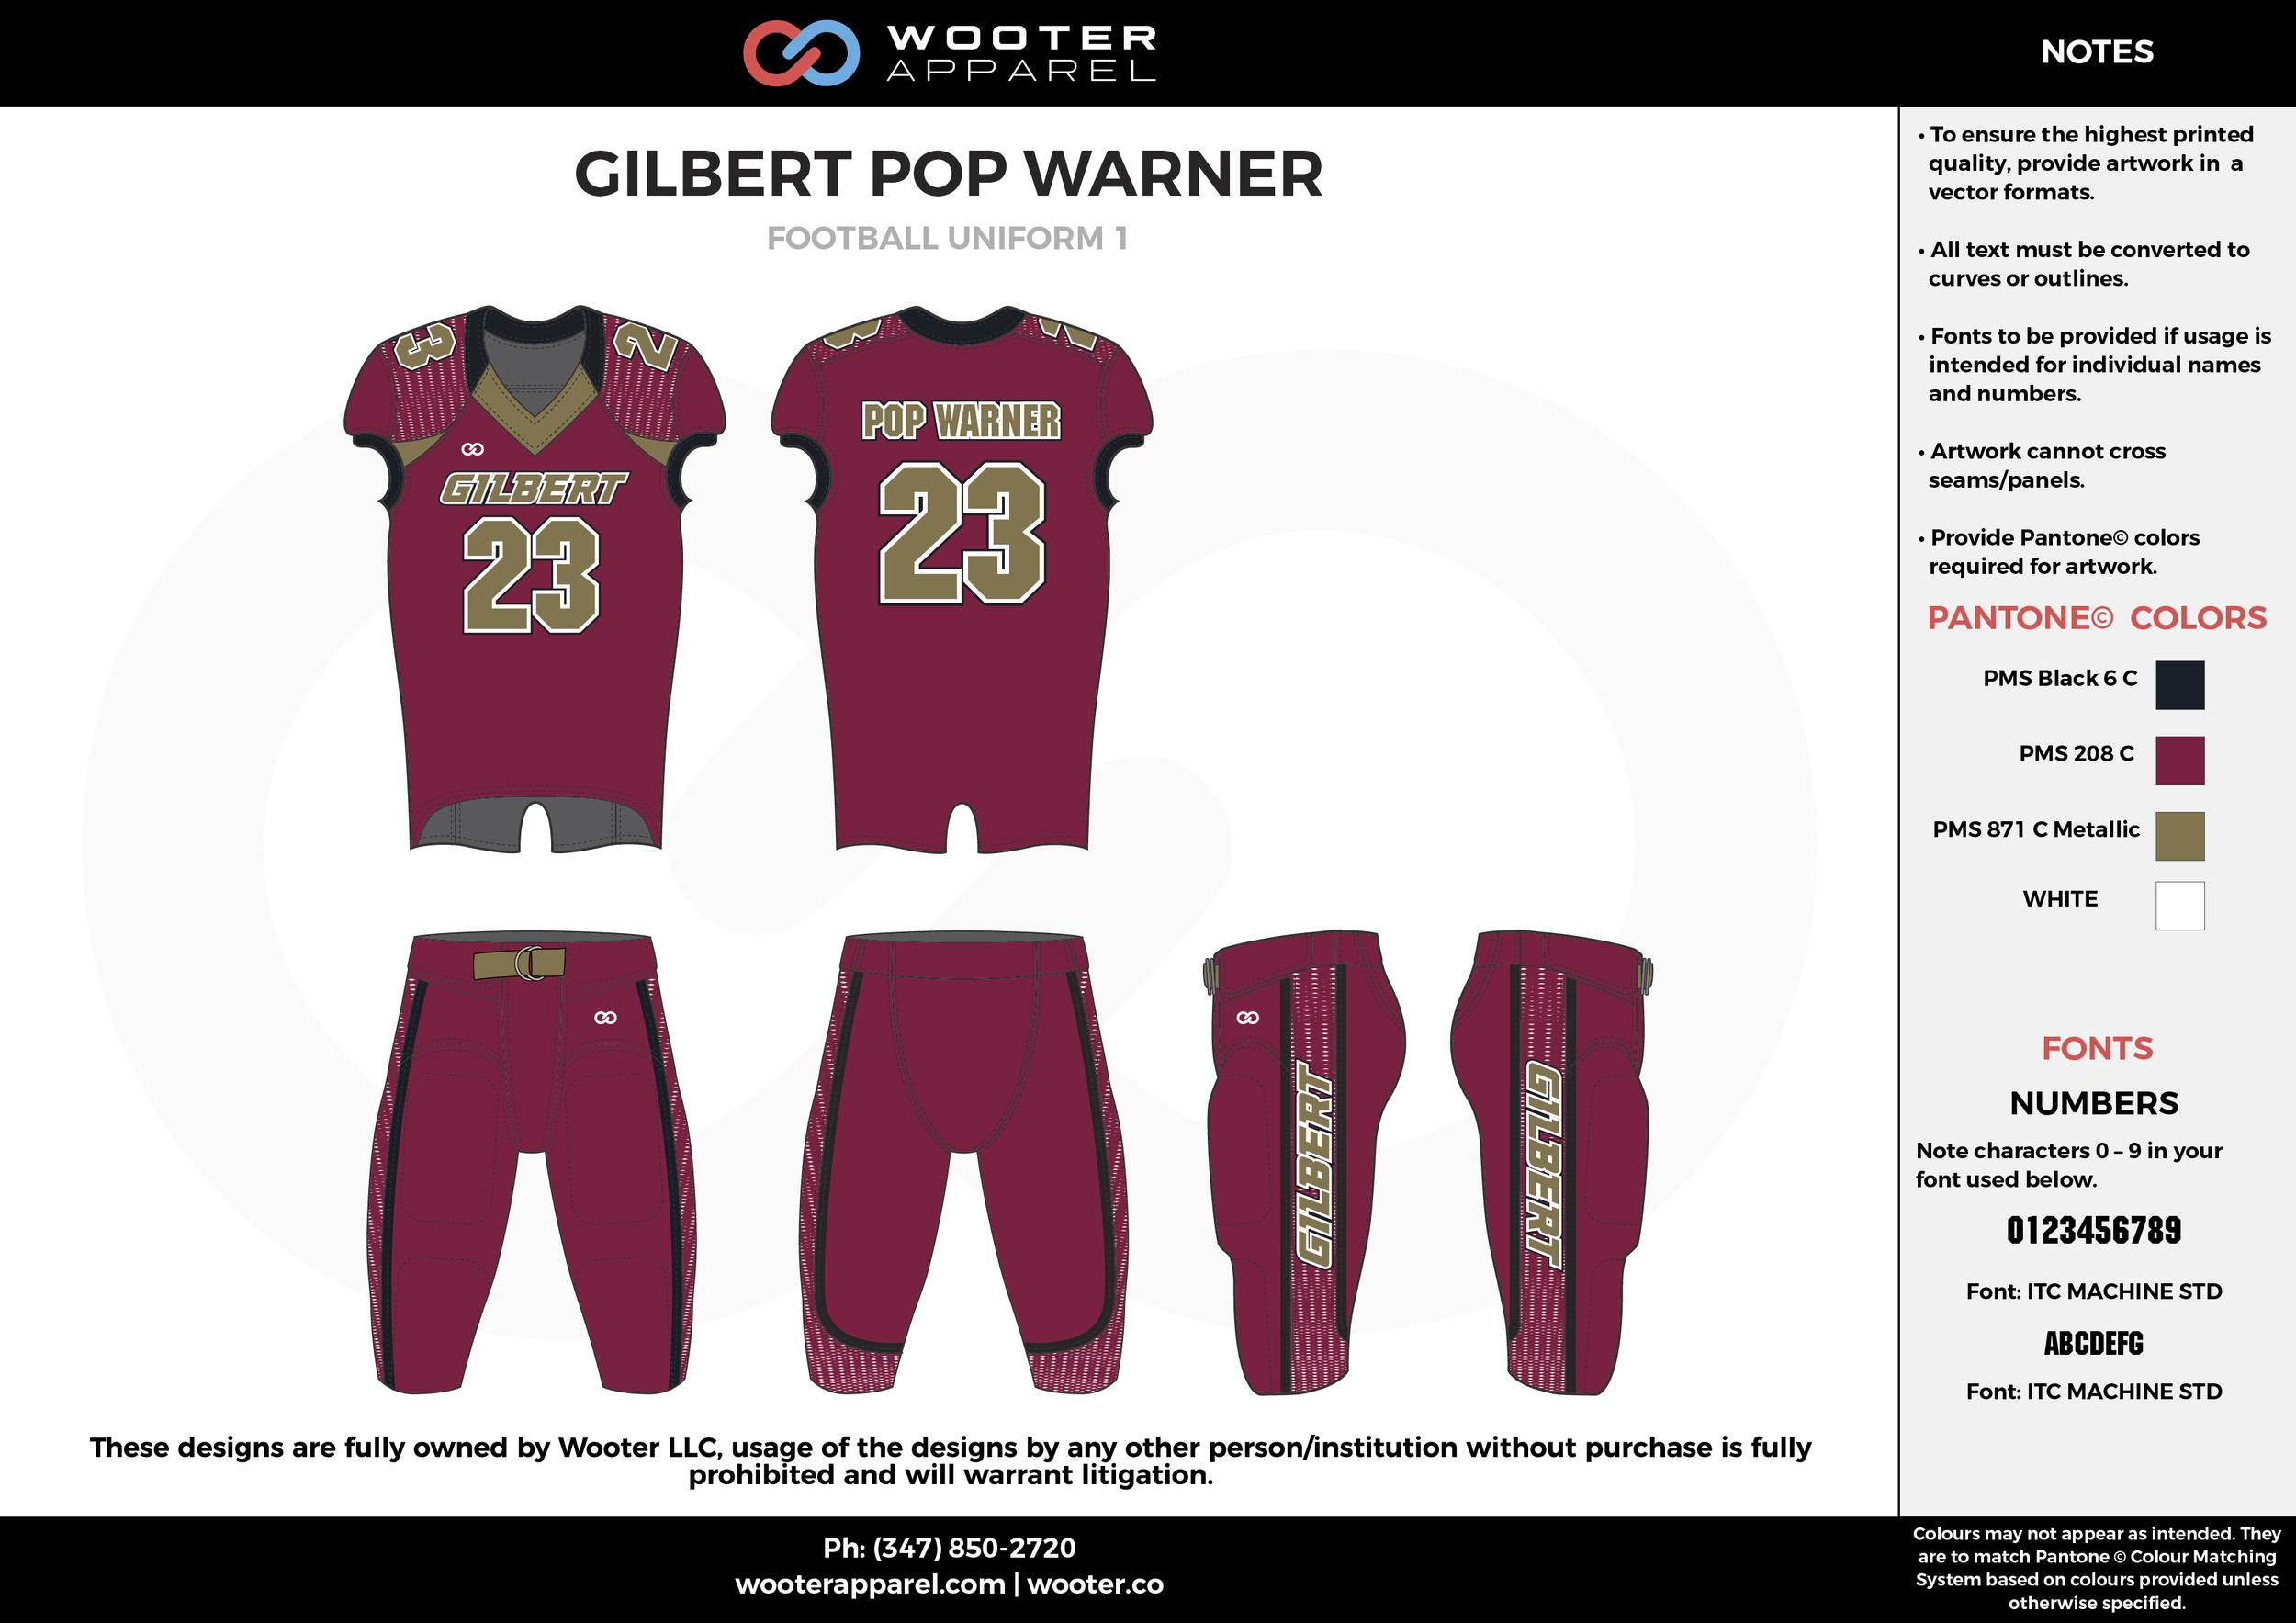 GILBERT POP WARNER maroon black beige football uniforms jerseys pants